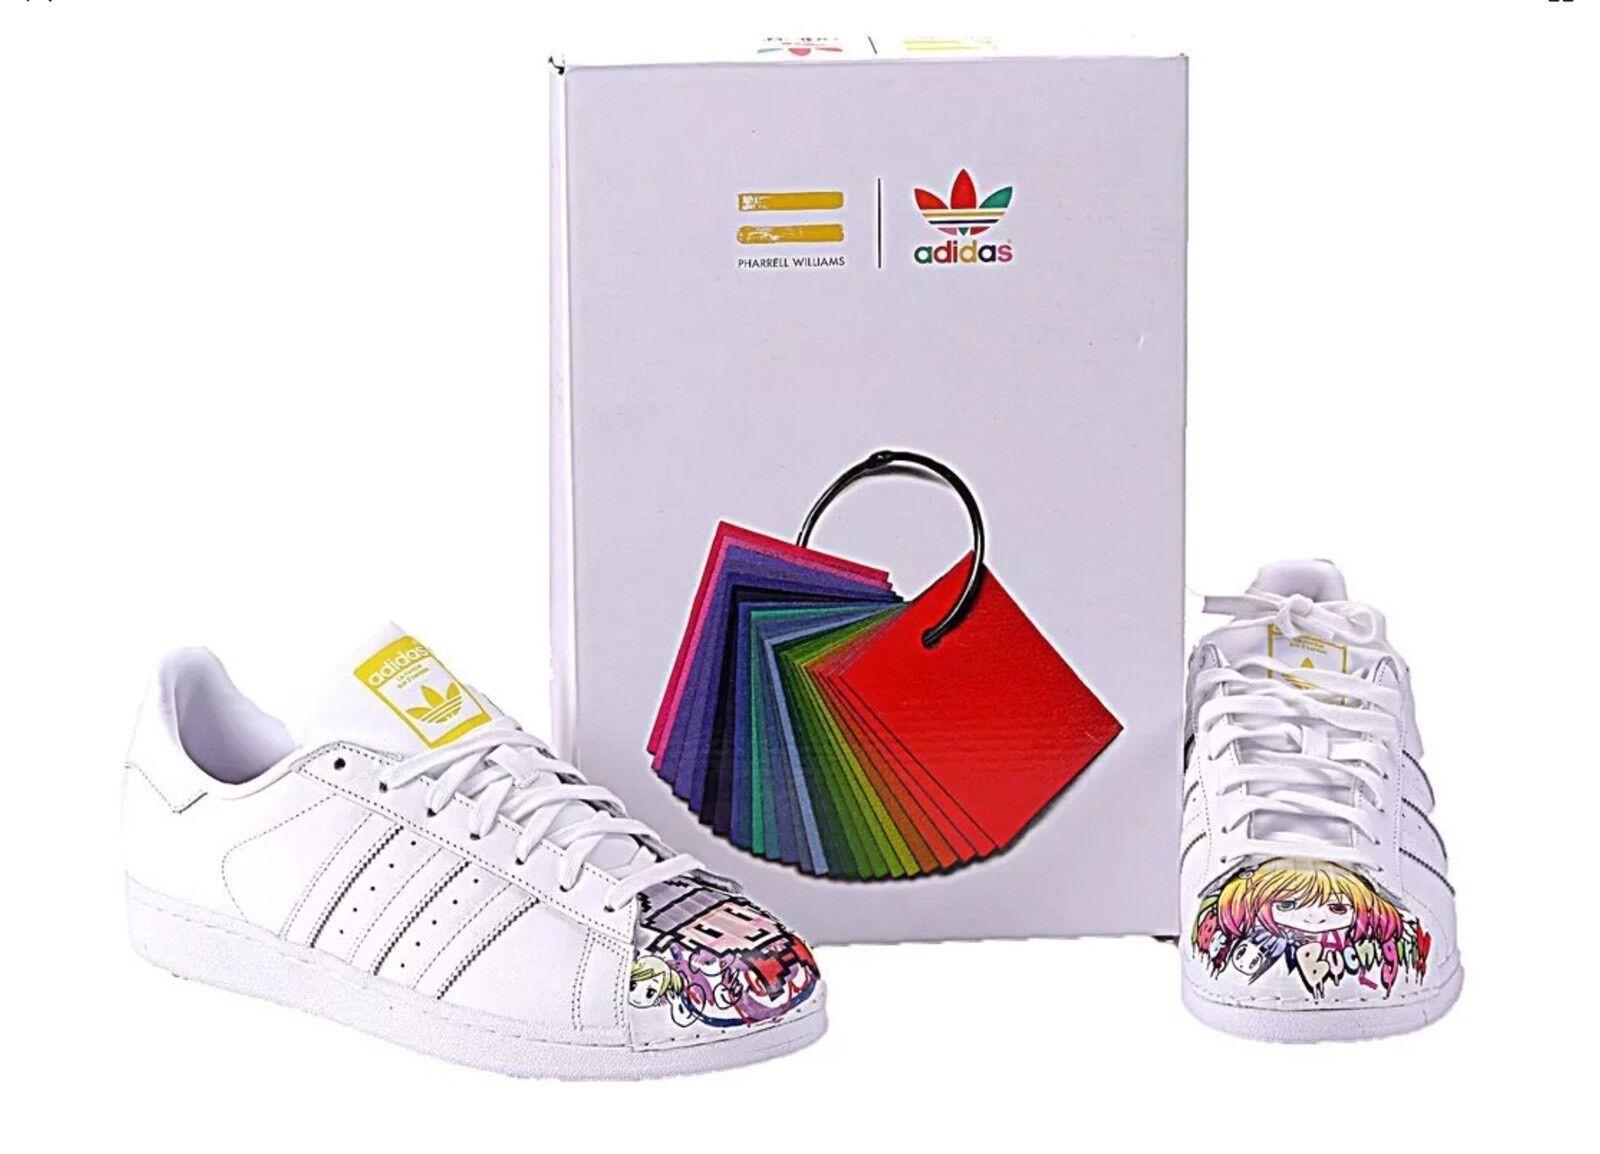 10e27356f07a7 Adidas Originals Superstar Pharrell Williams Super SH S83354 Unisex Unisex  Unisex 6b01d3